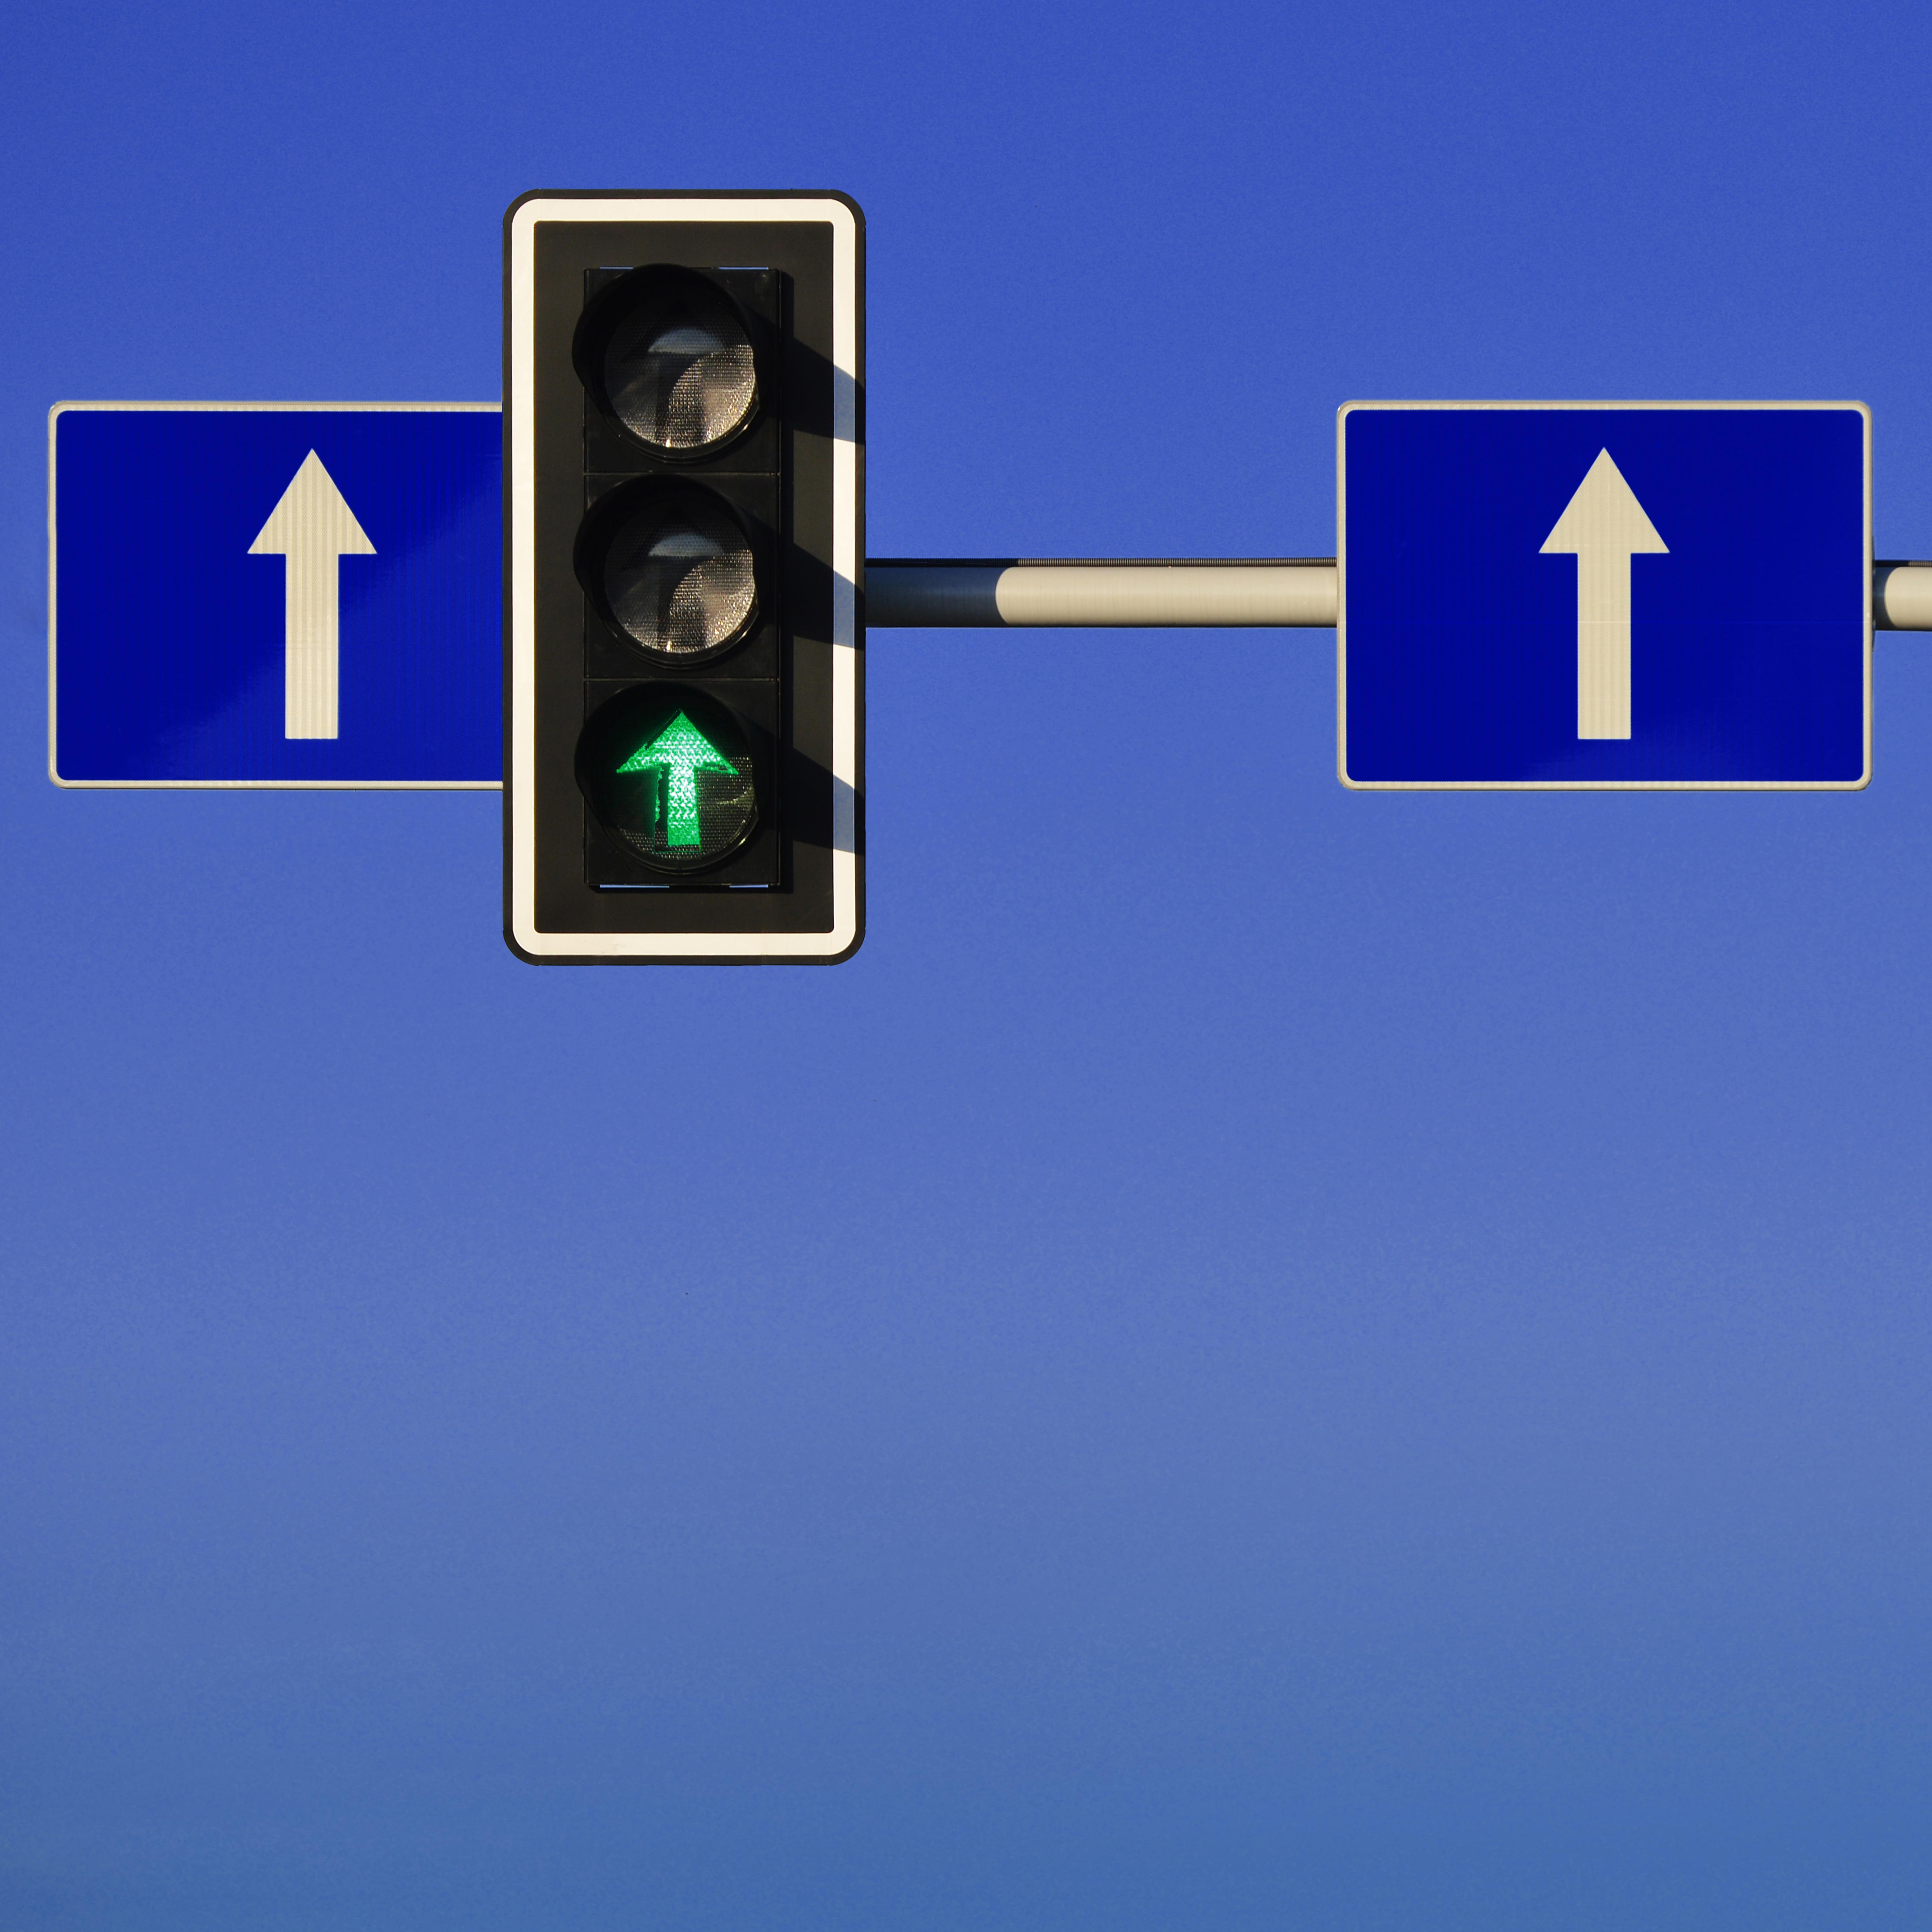 18-1003_Traffic Light_SQ